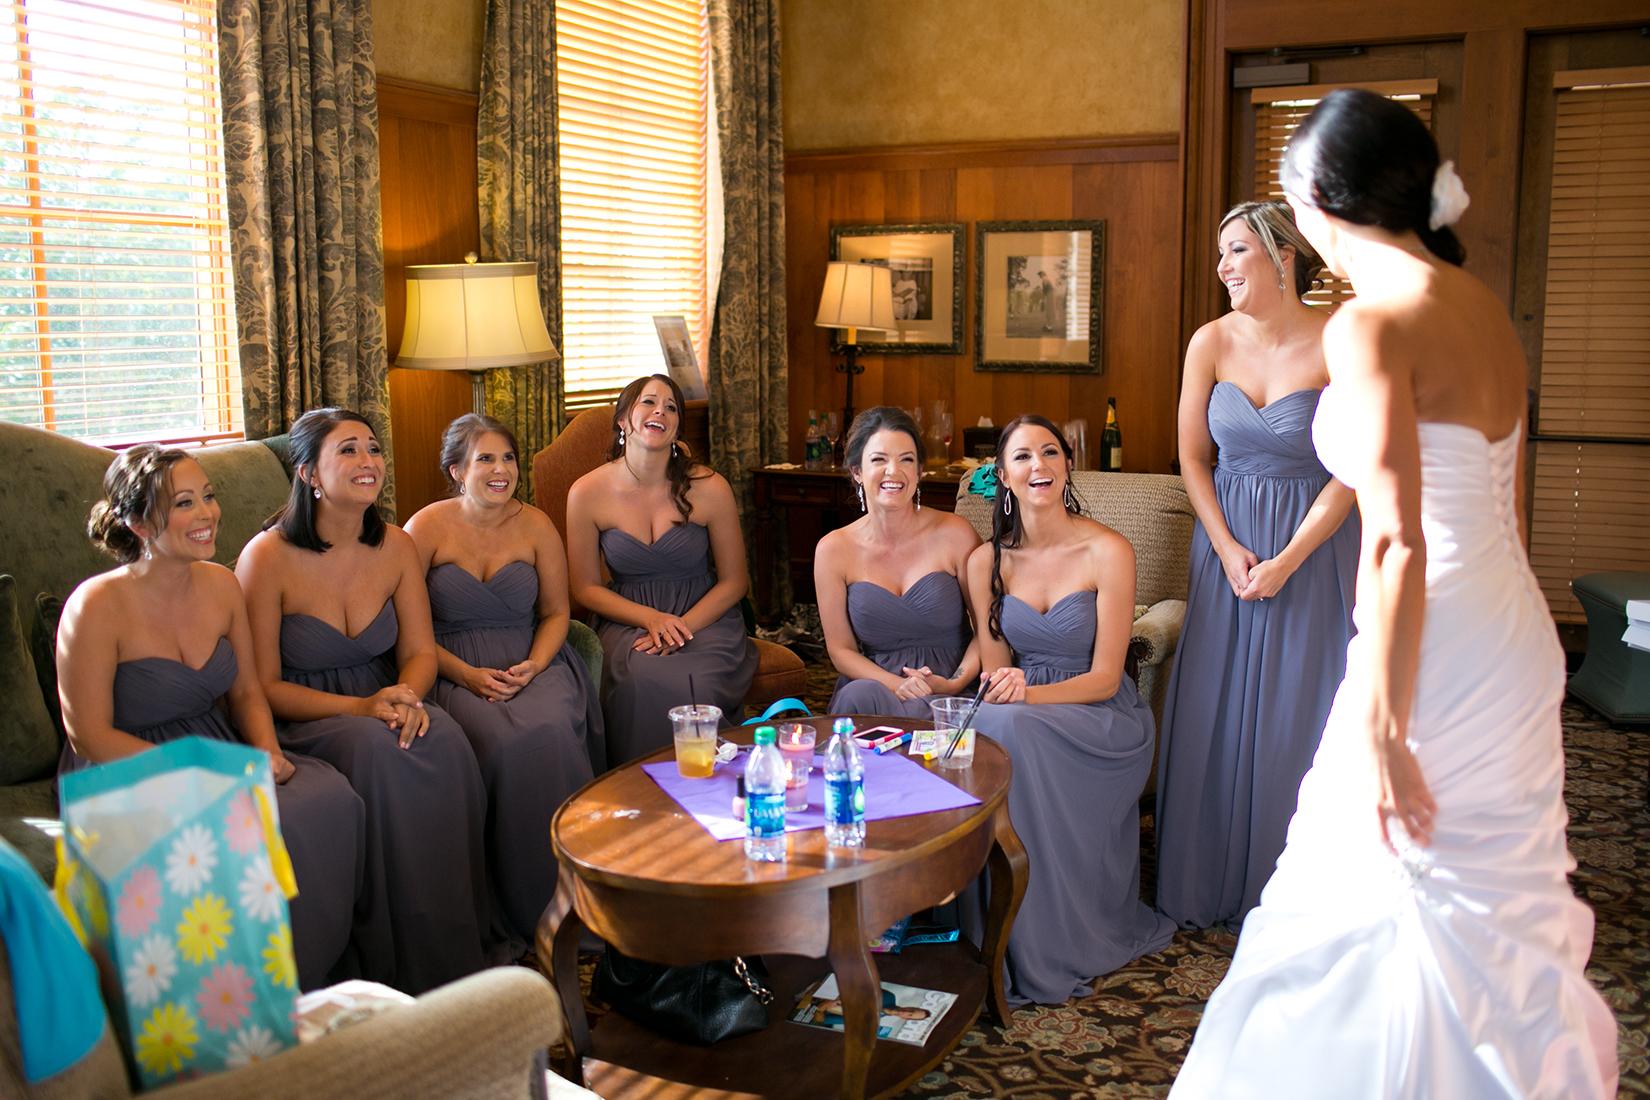 adam-szarmack-tpc-sawgrass-ponte-vedra-wedding-photographer-PZ3A9487.jpg